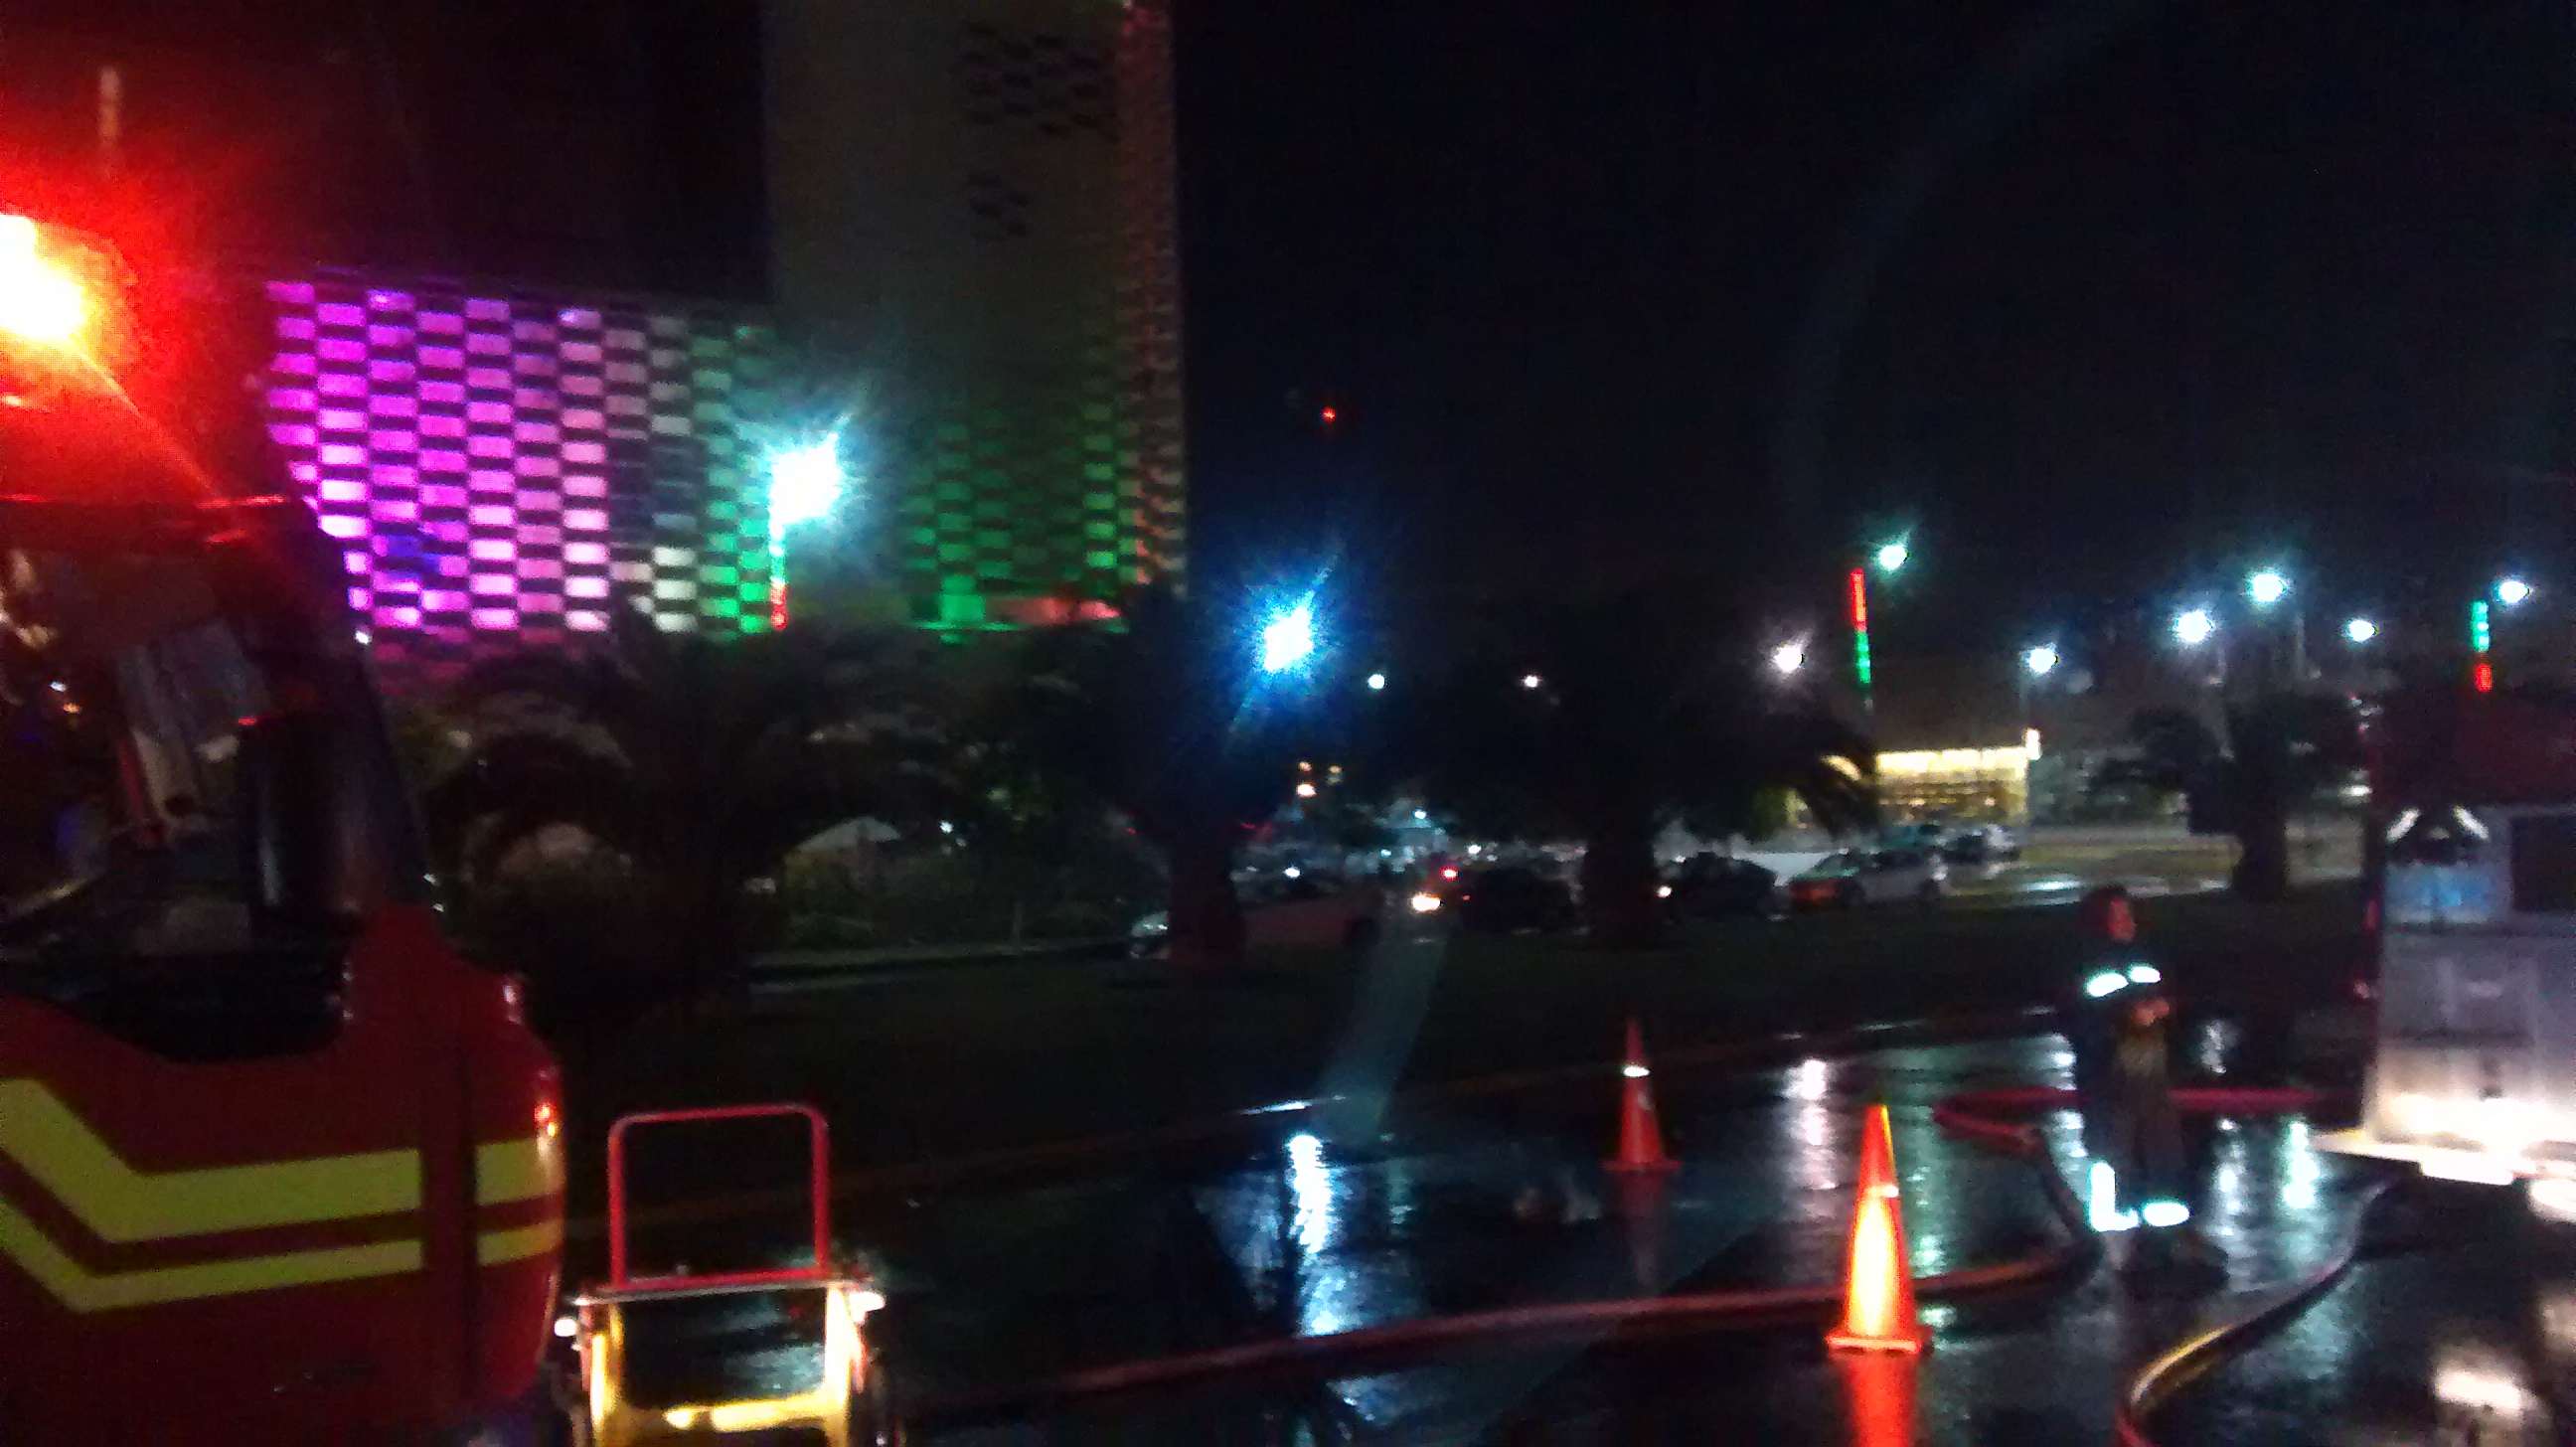 Incendio Afectó esta Madrugada a Discoteca Terrazas Club en Talca